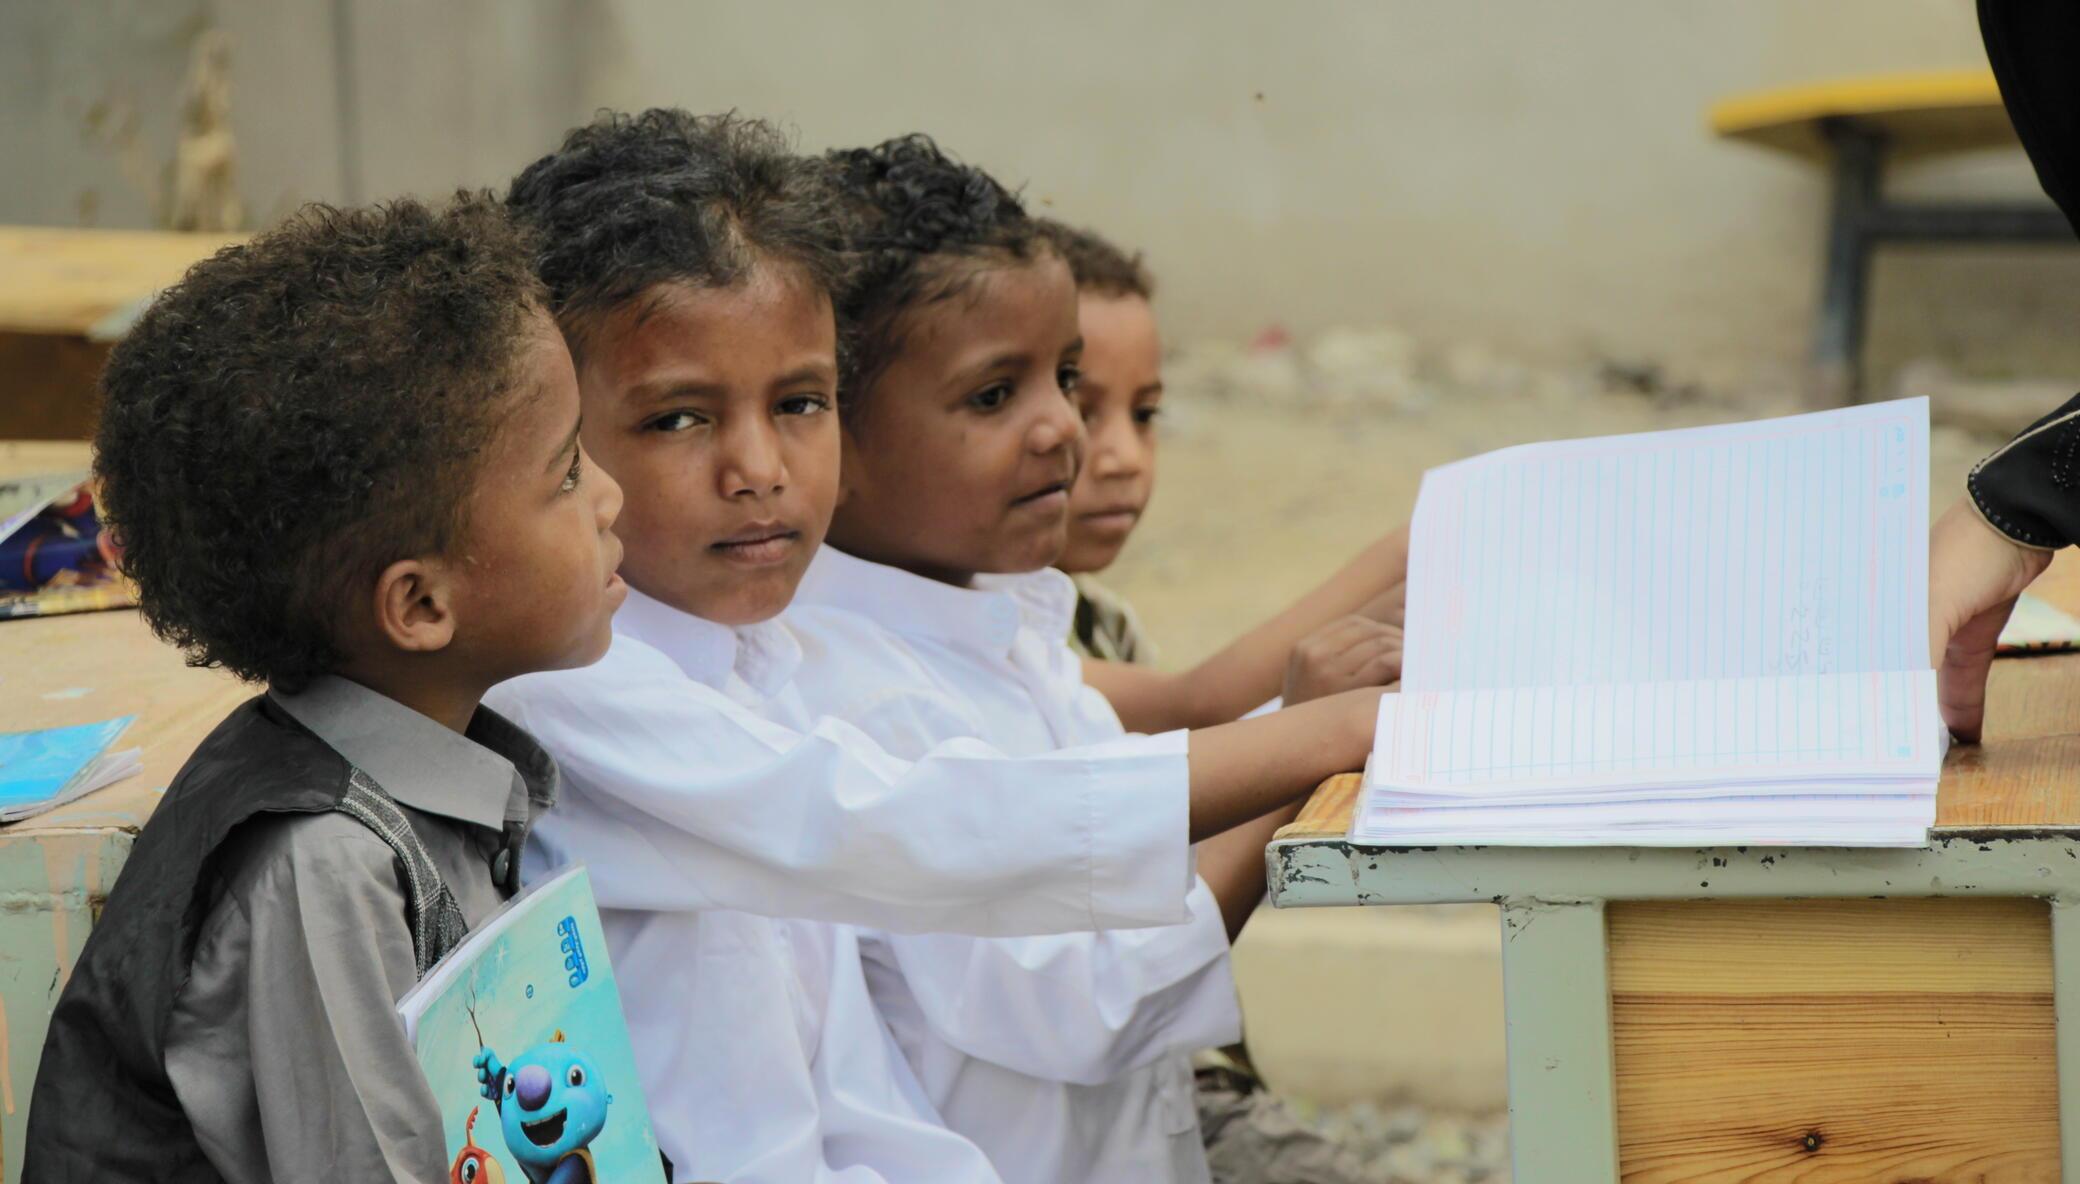 Restore devastated classrooms in Marib, Yemen